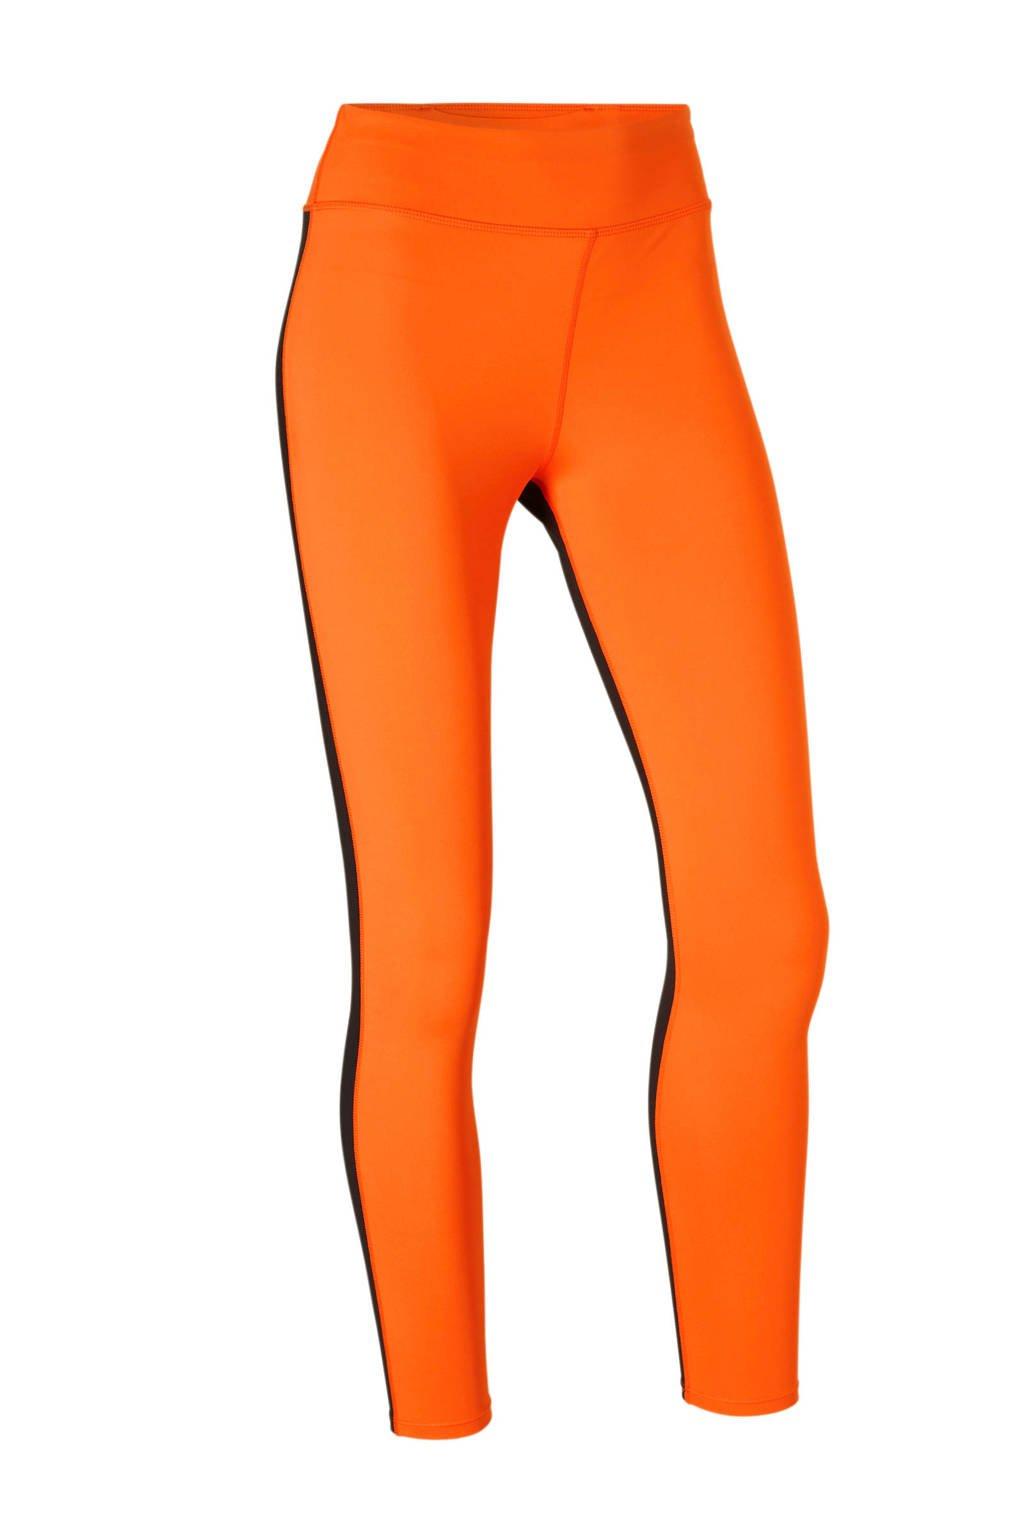 Calvin Klein Performance legging oranje, Oranje/zwart